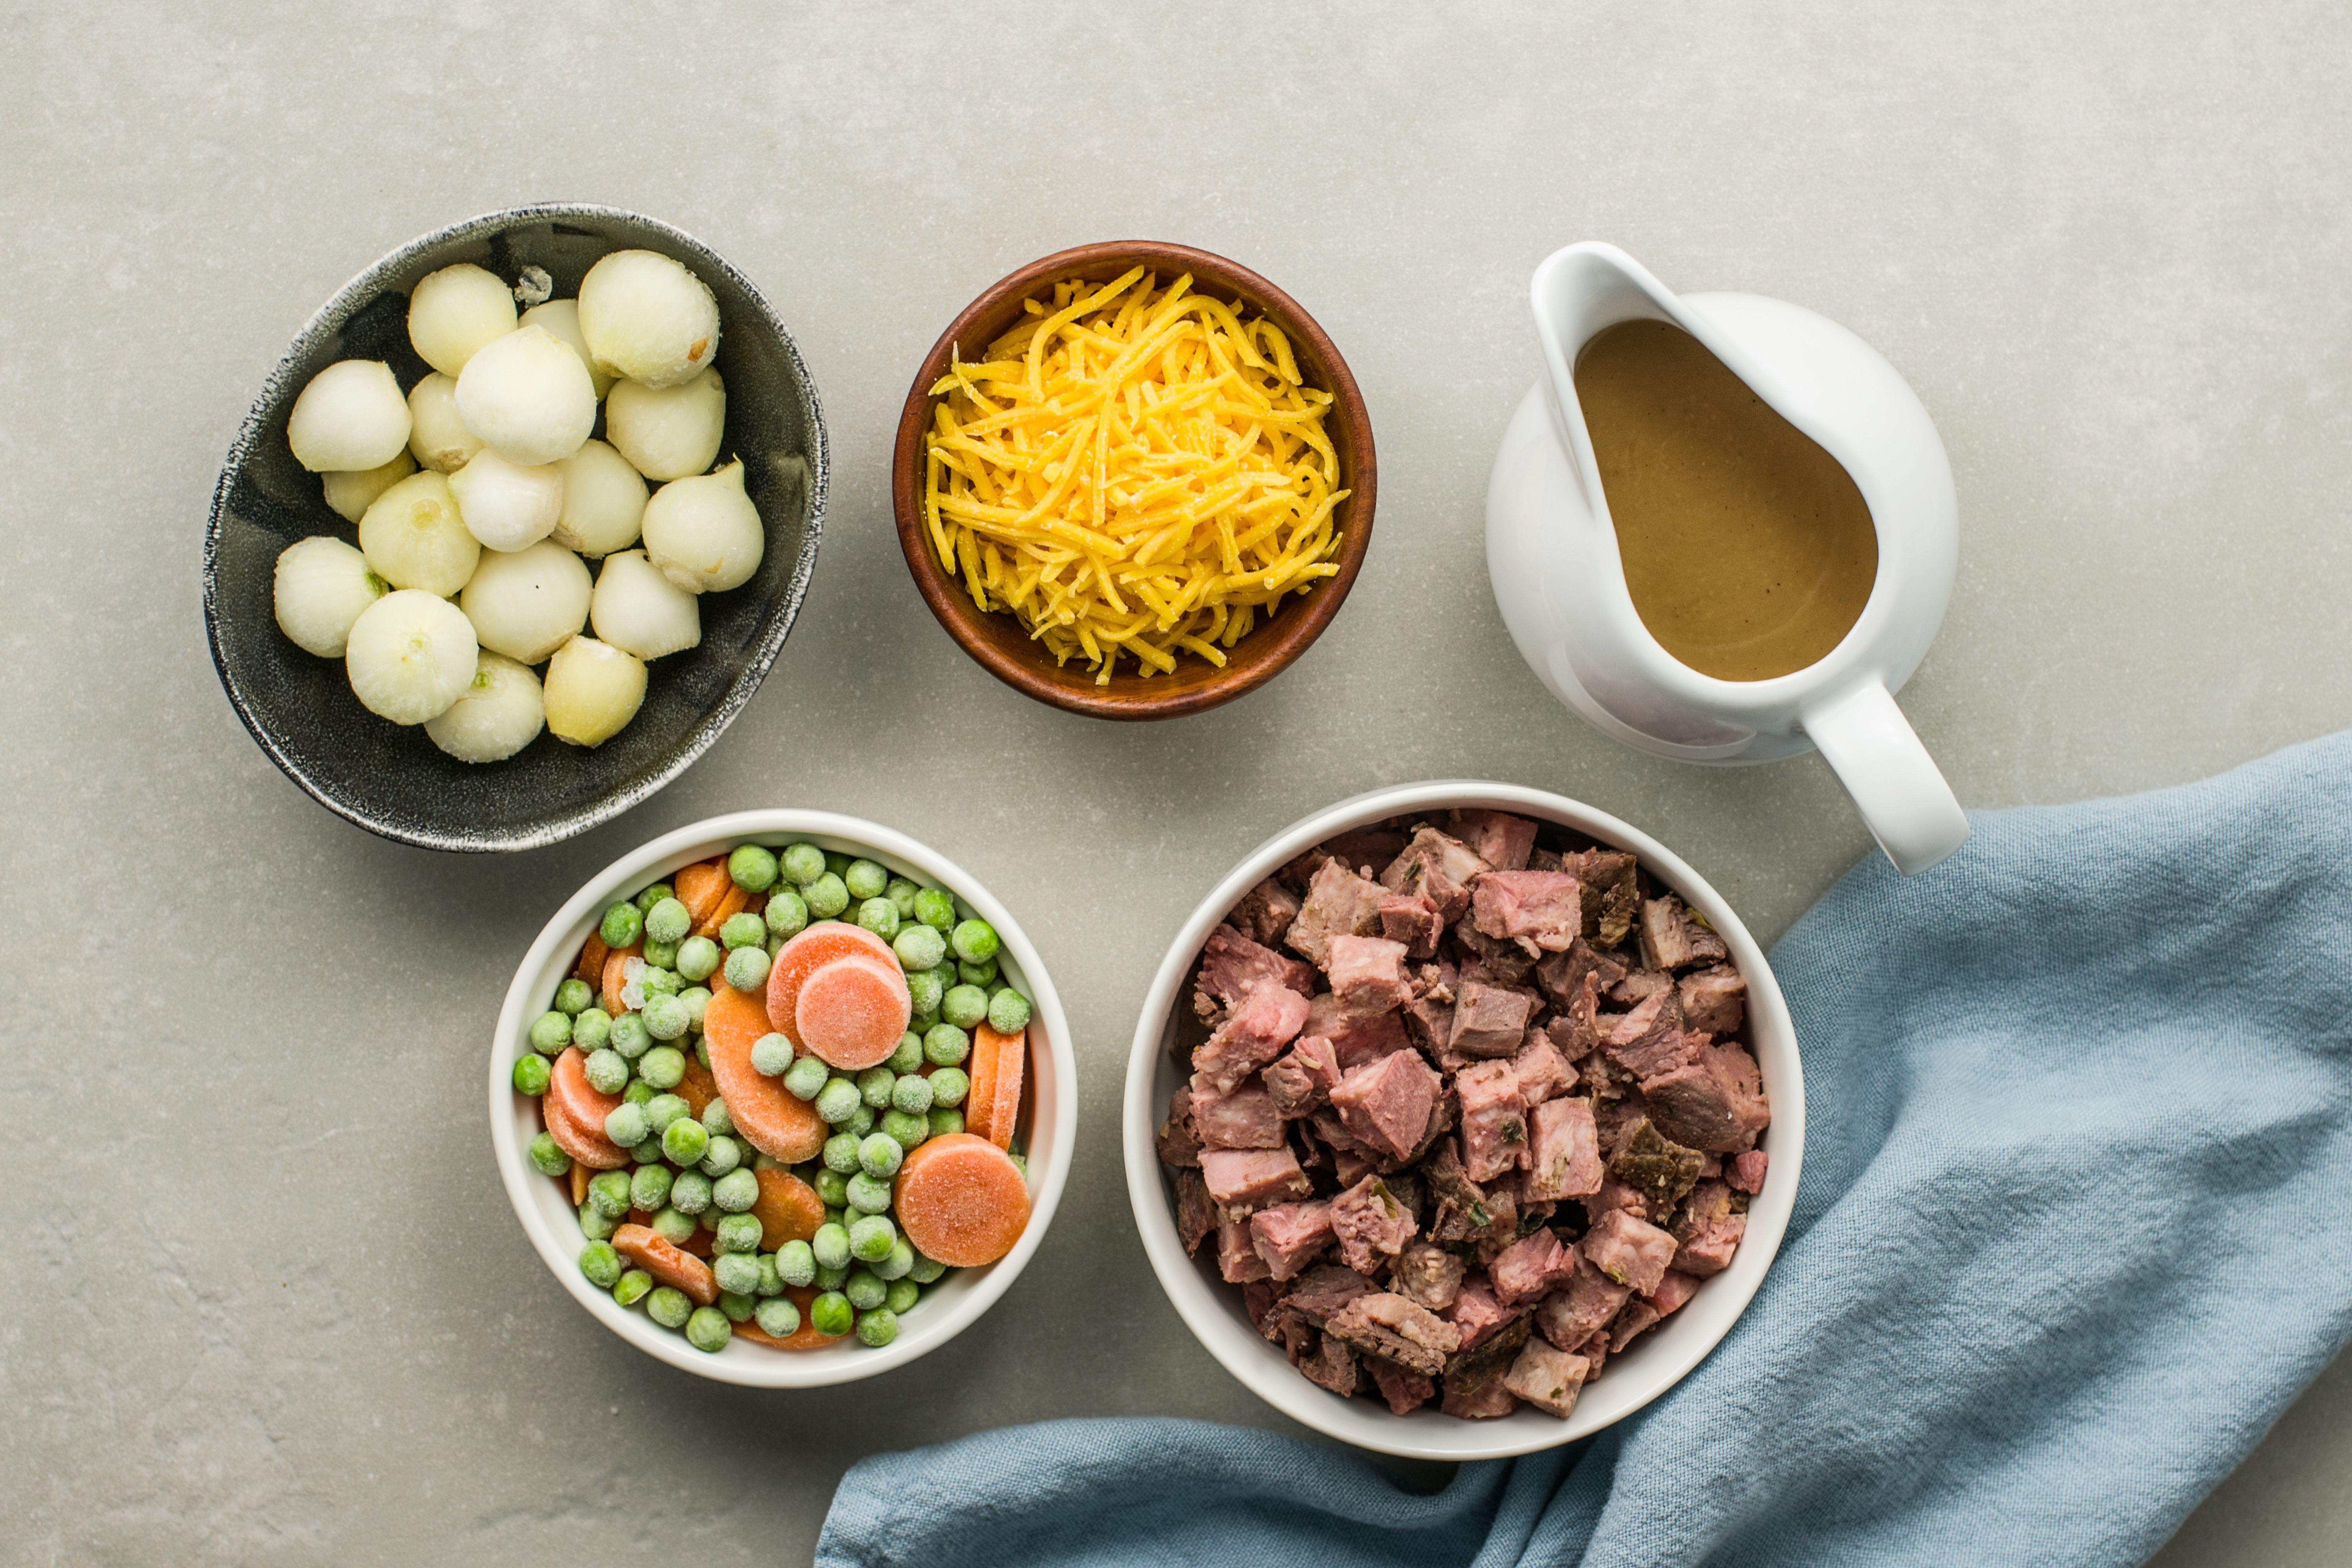 Leftover roast beef casserole recipe ingredients